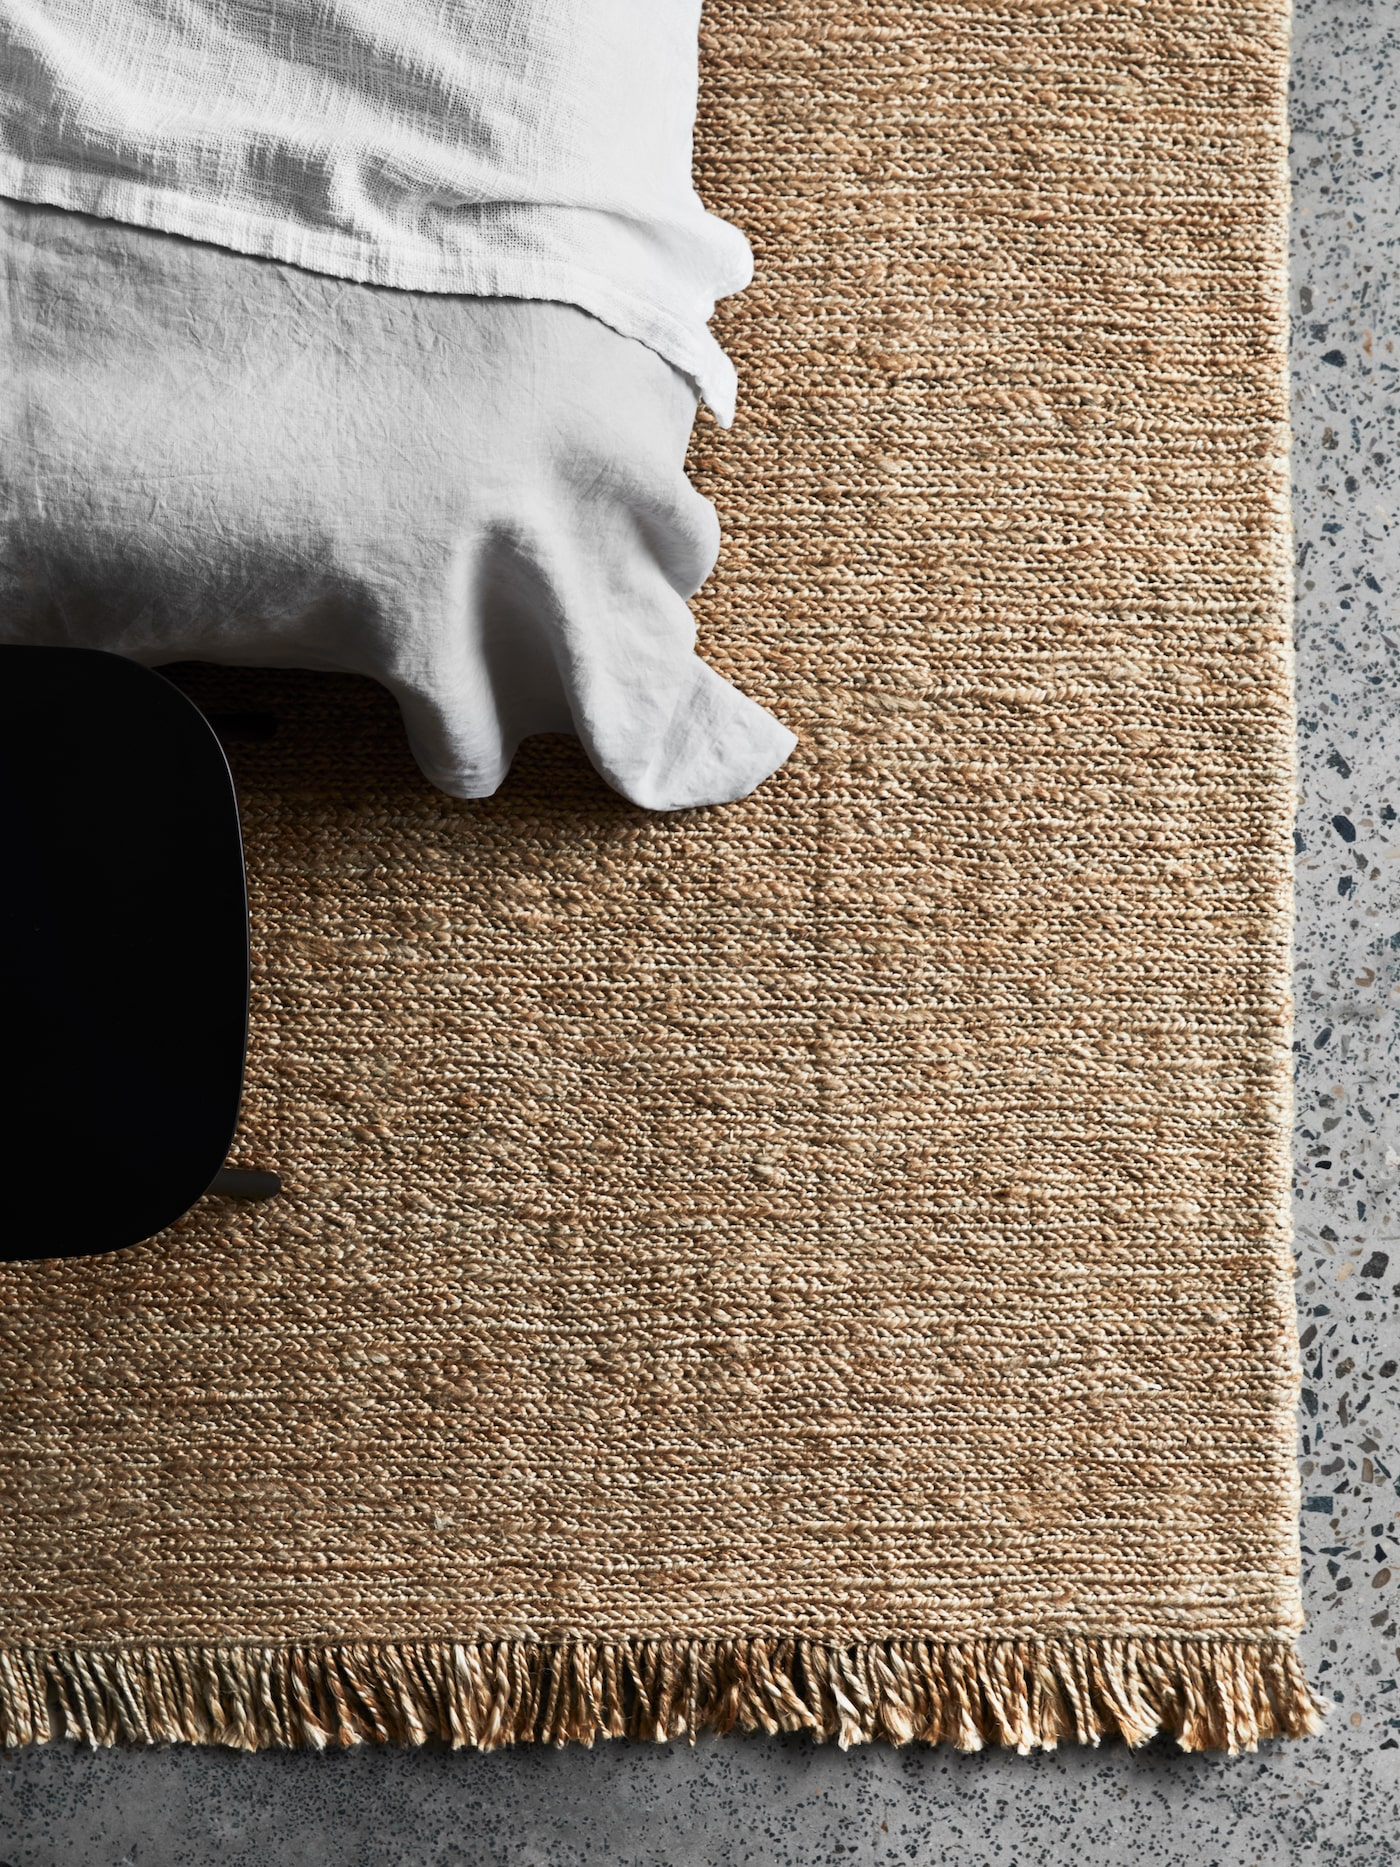 Natural rug on concrete floor under bed